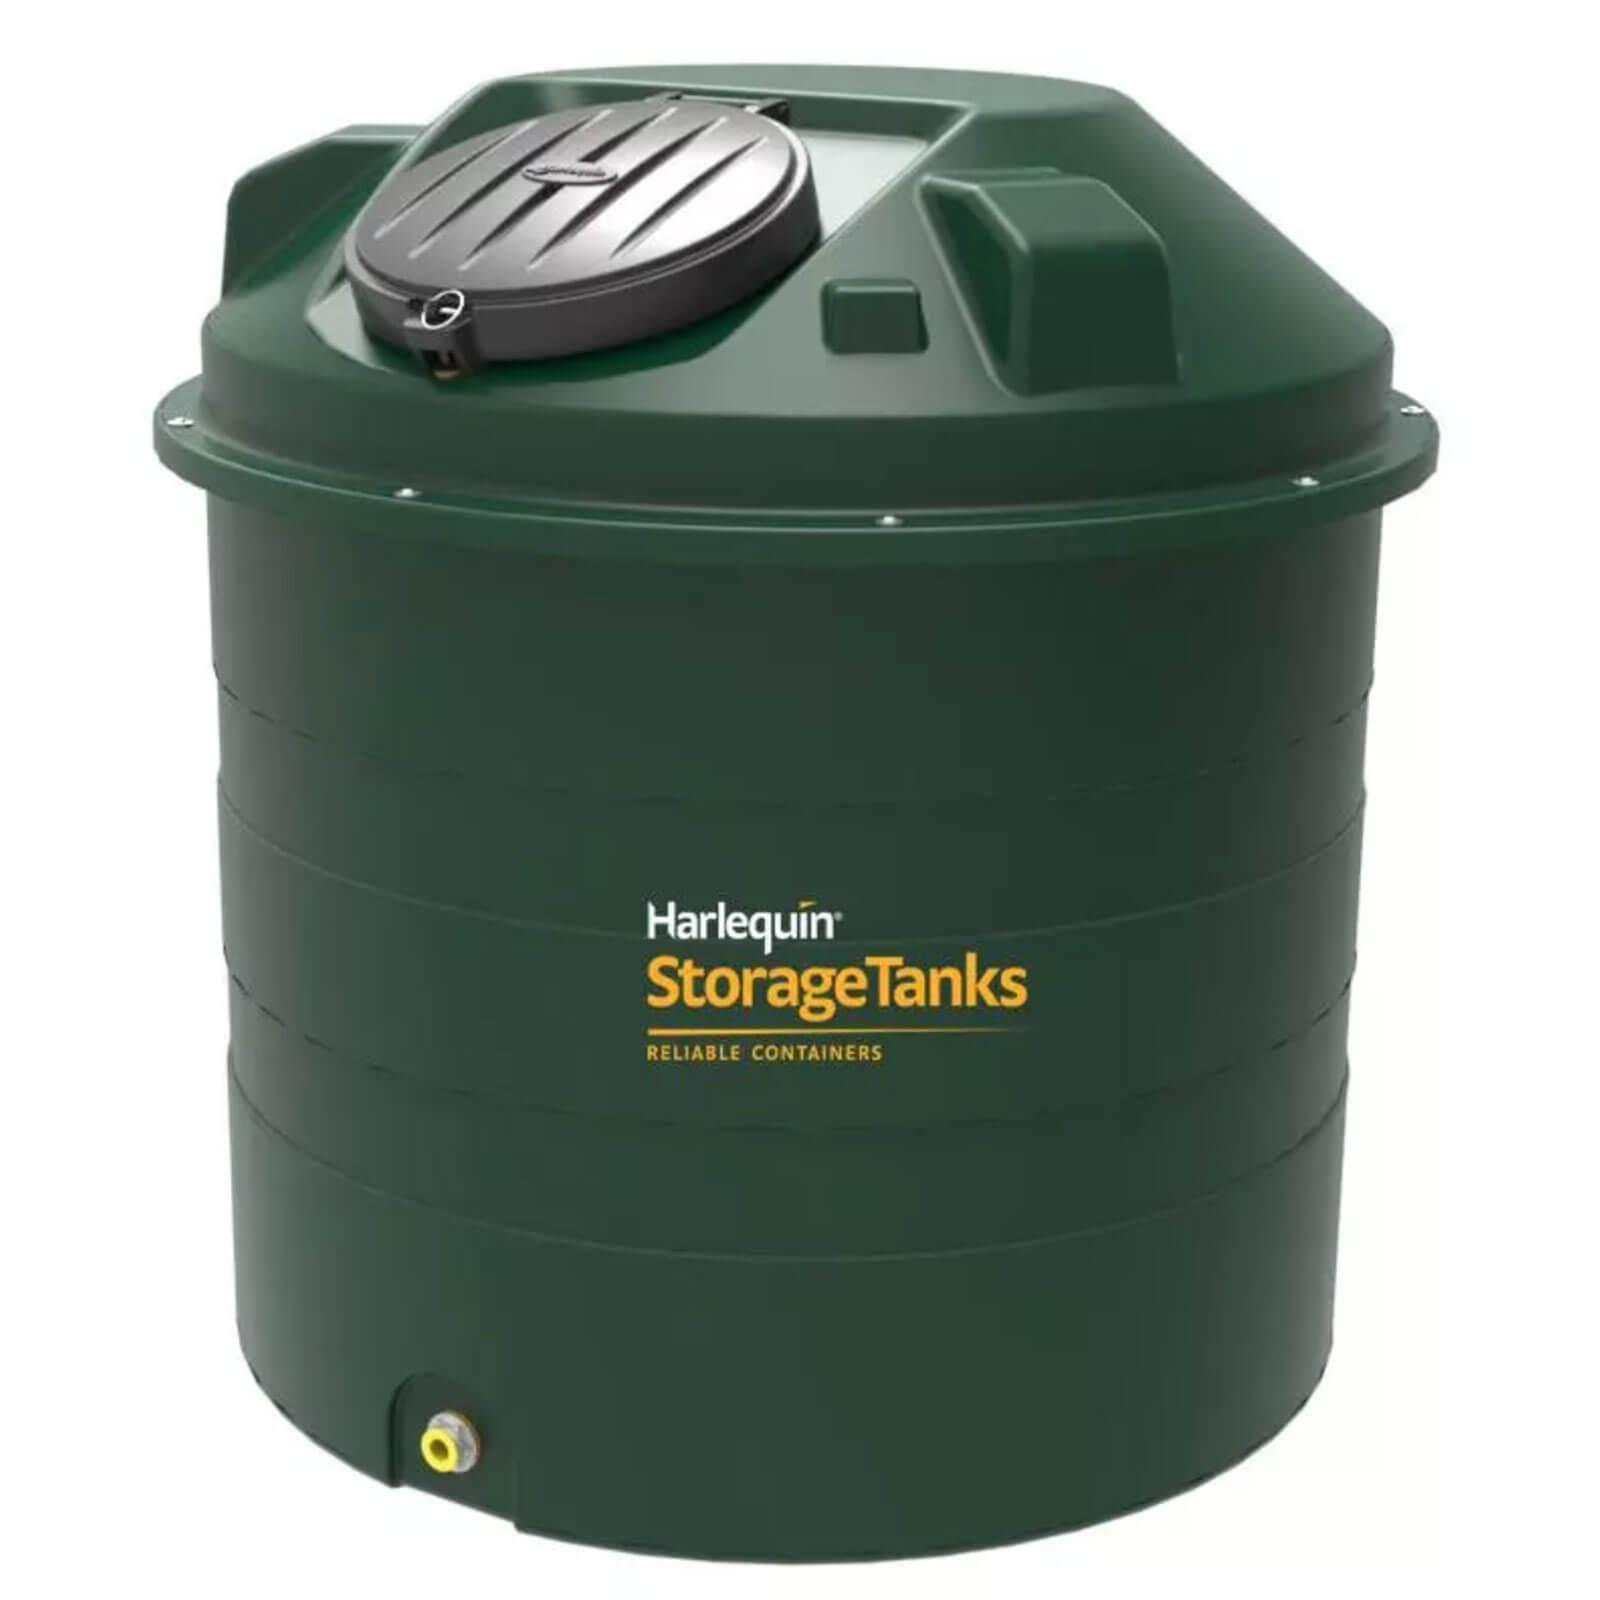 1450 bunded beehive shaped green plastic oil tank